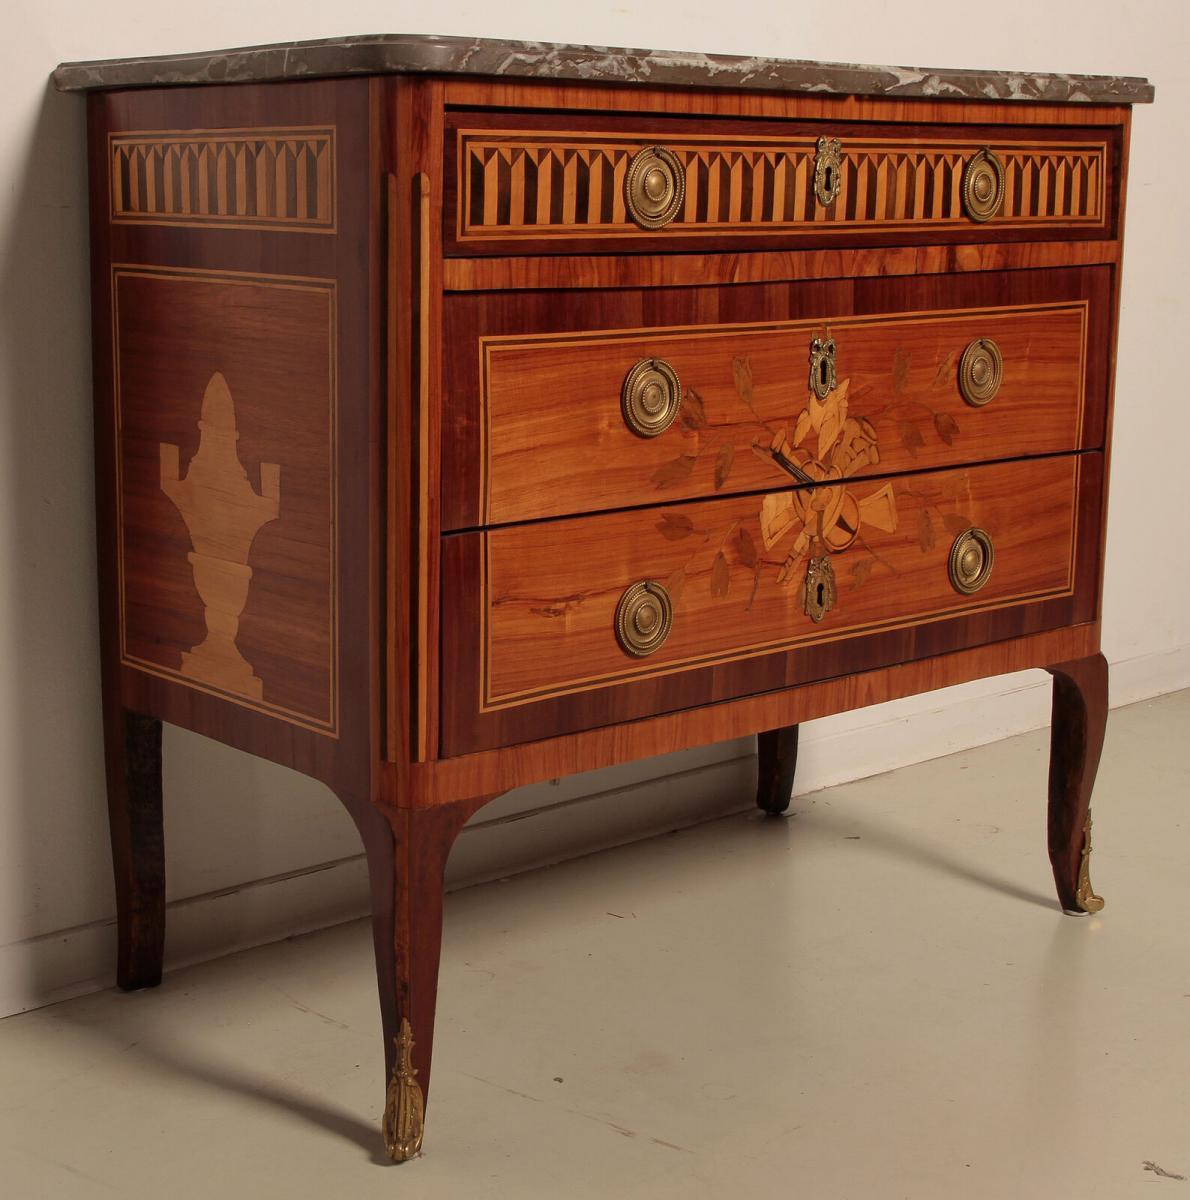 Louis Seize Stil Kommode gefertigt um 1900 aus diversen Hölzern Antik Kolosseum 1